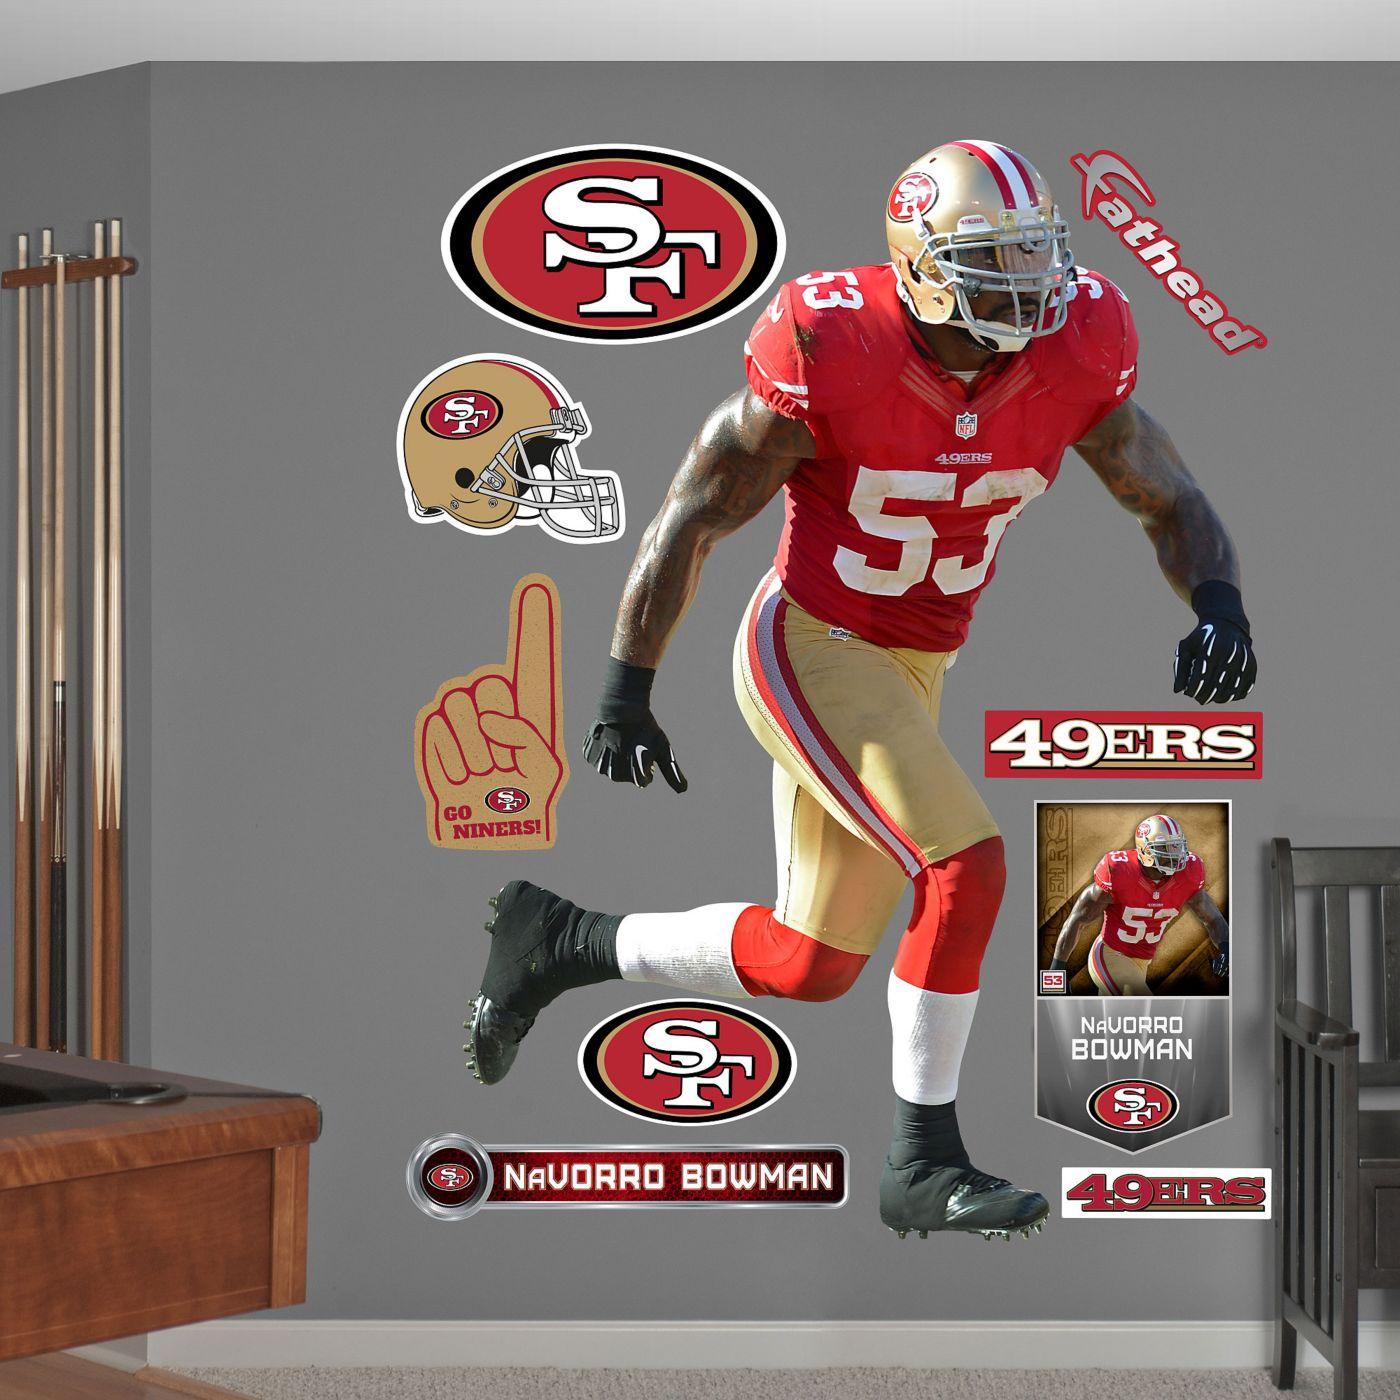 Fathead NaVorro Bowman #53 San Francisco 49ers Real Big Wall Graphic